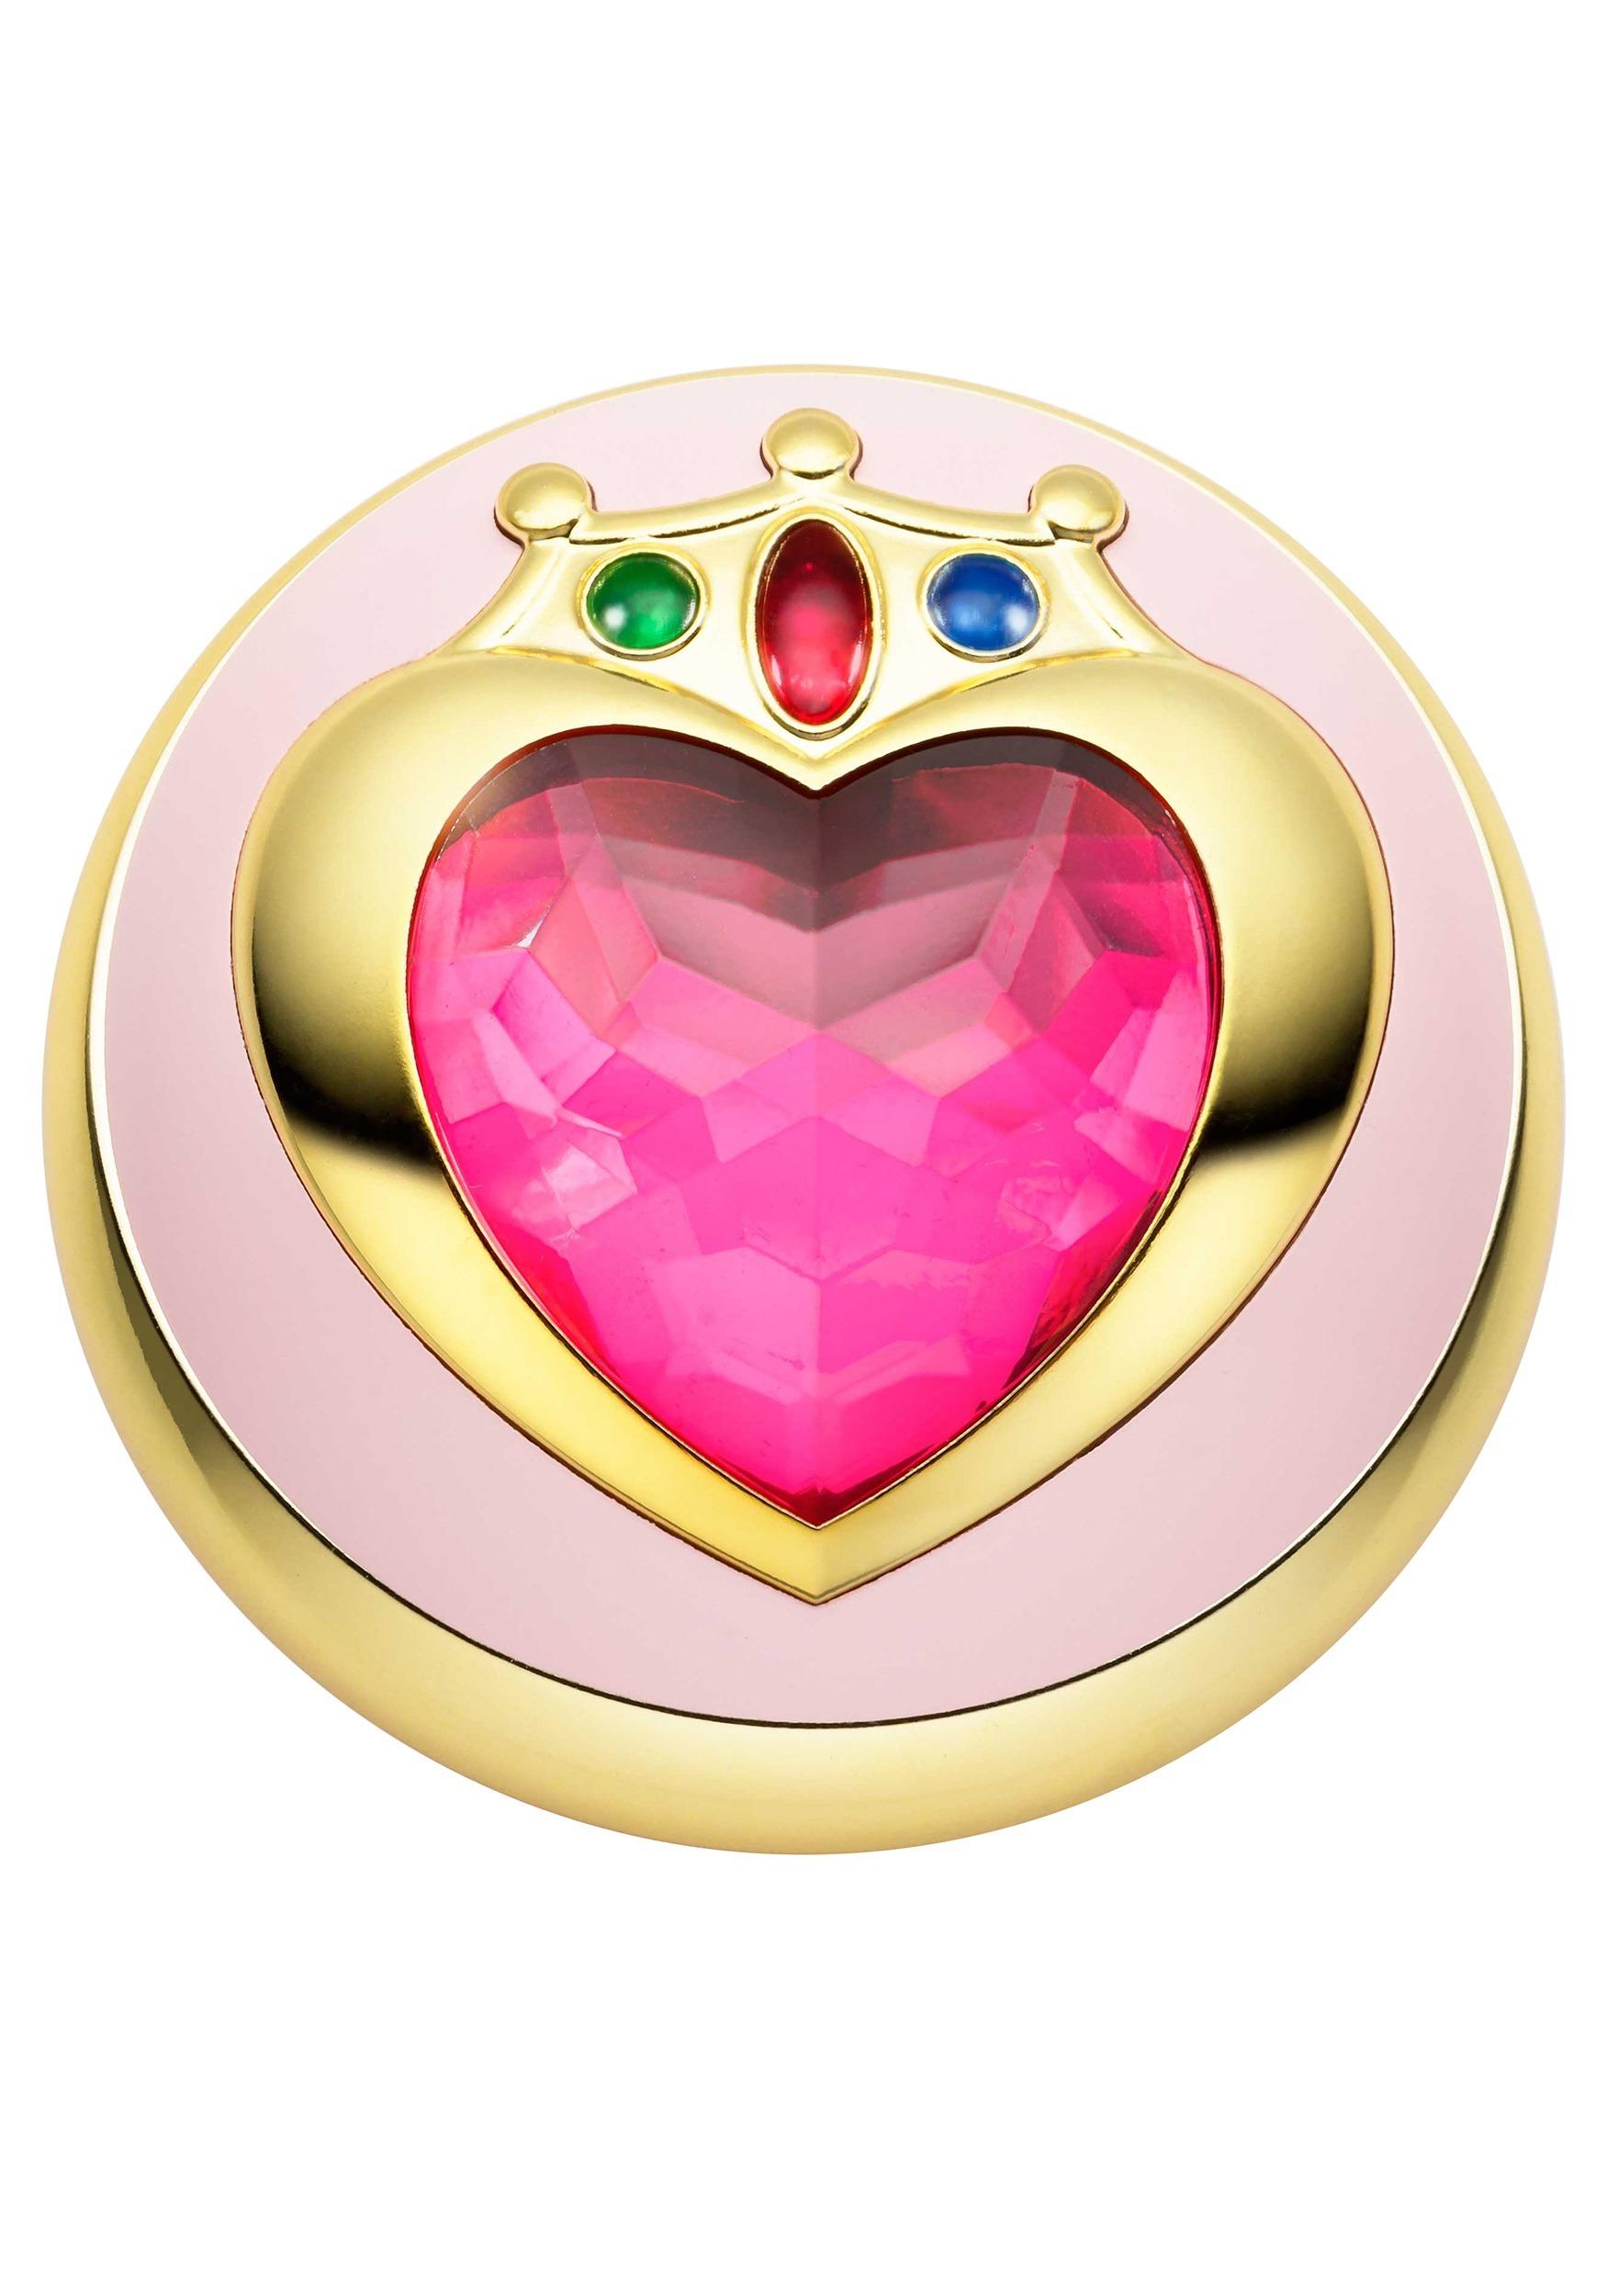 Bandai_Proplica_Sailor_Chibi_Moon_Prism_Heart_Compact